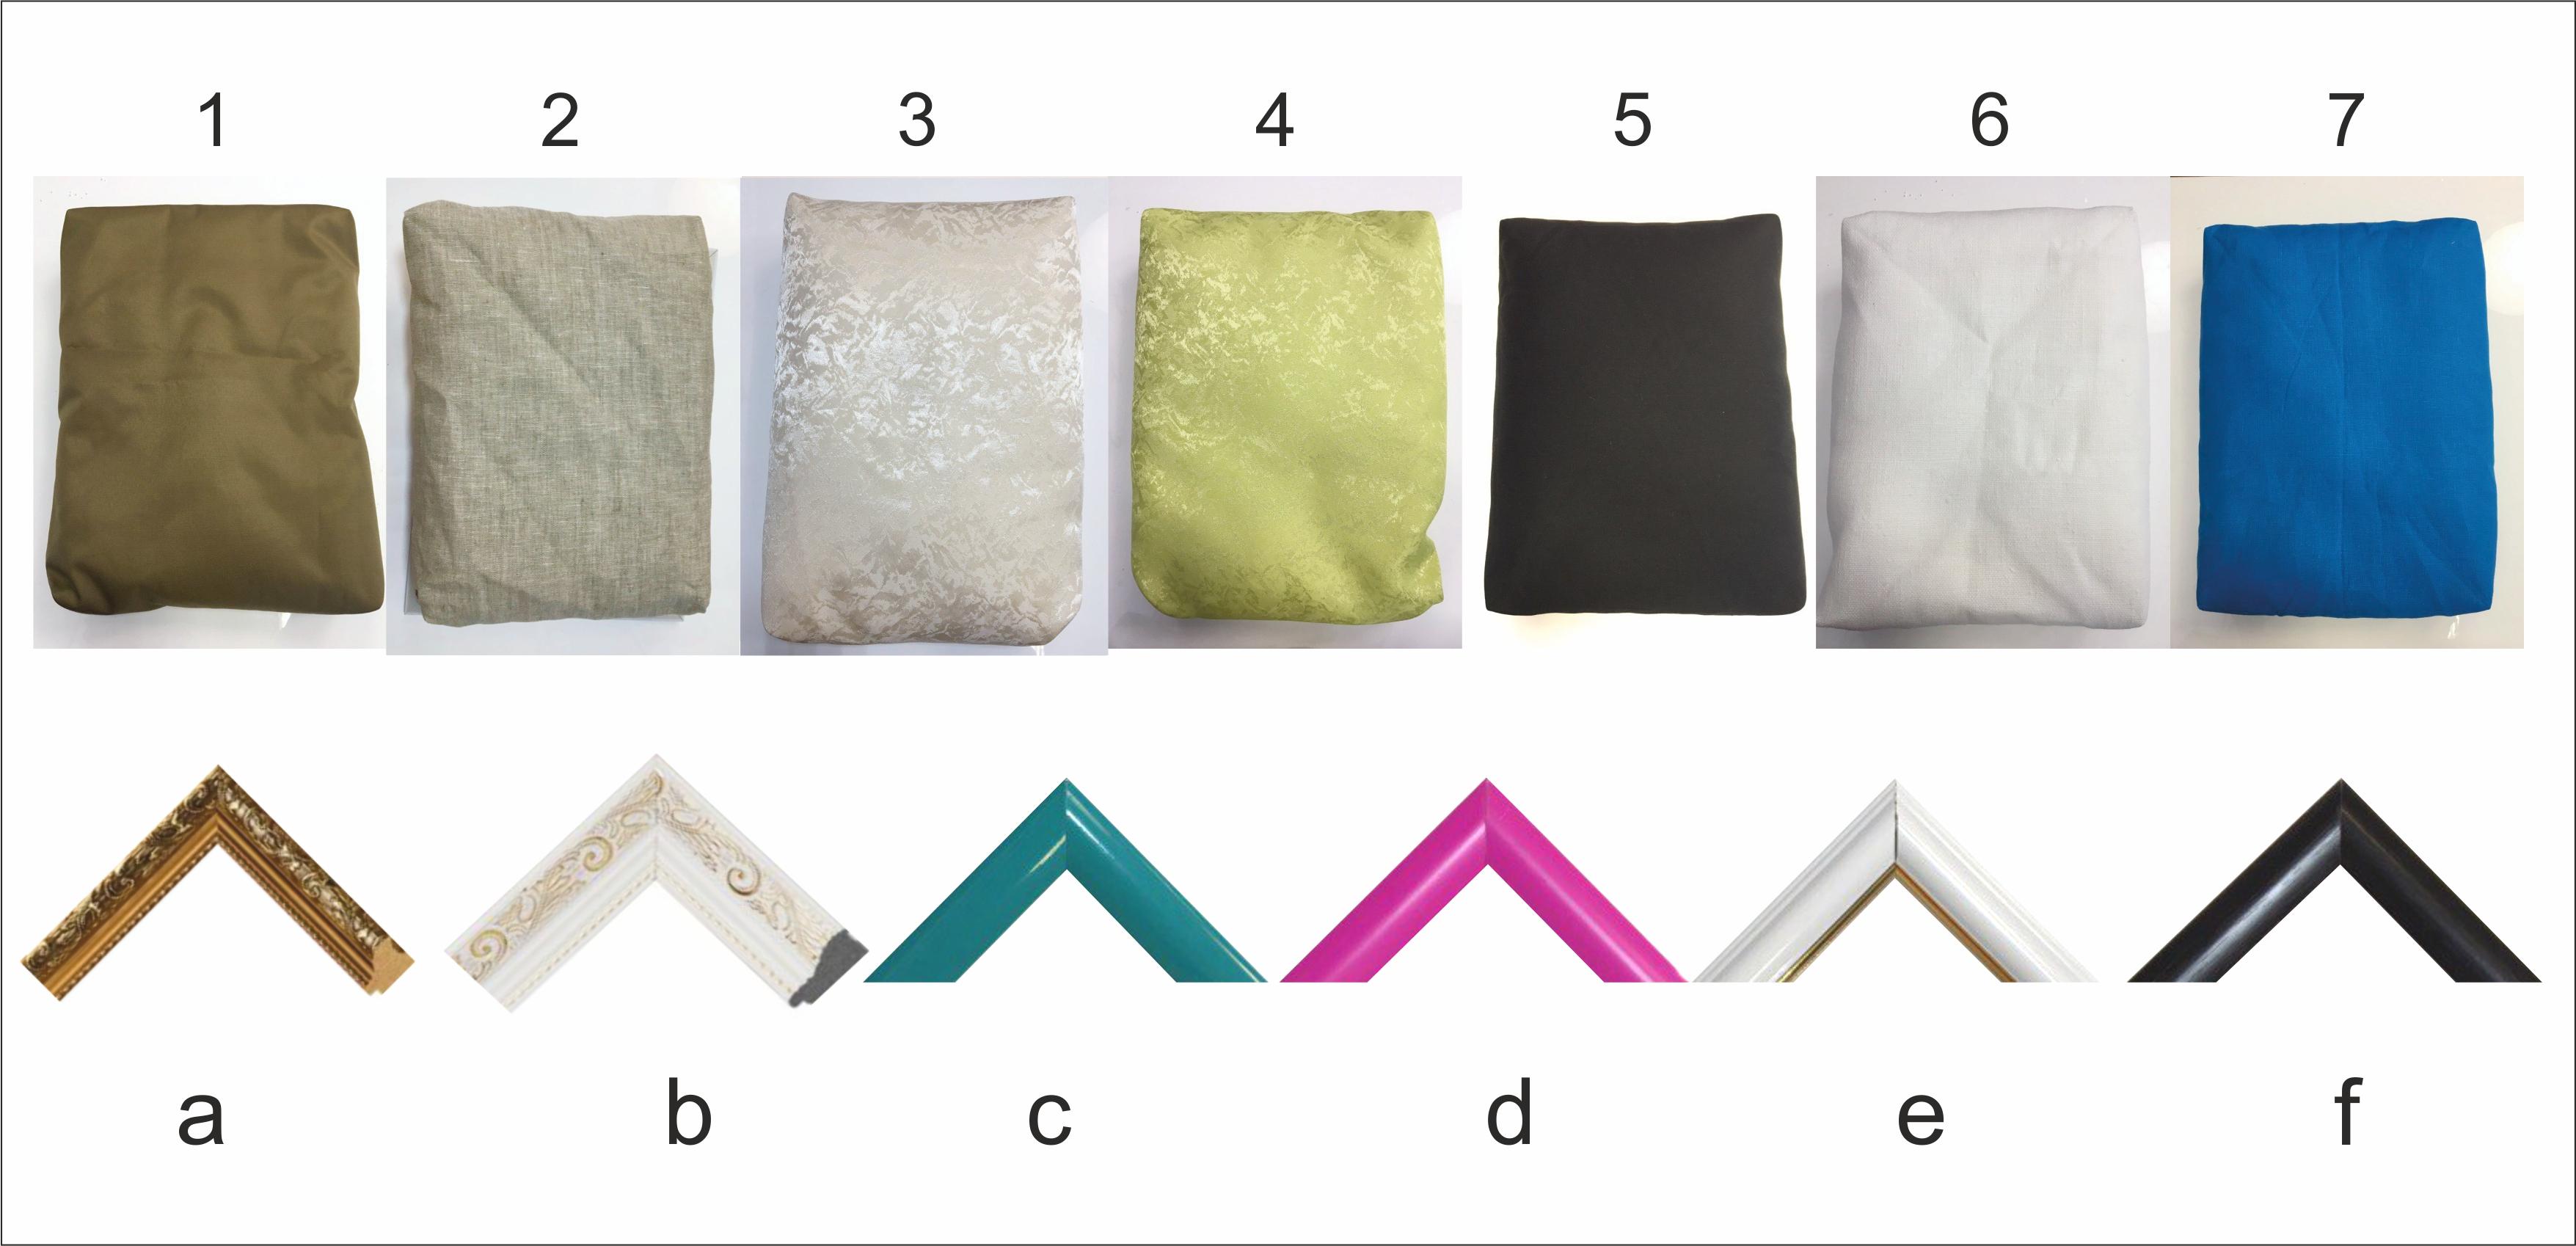 Поднос на подушке, столик для ноутбука или завтрака от 28 руб.